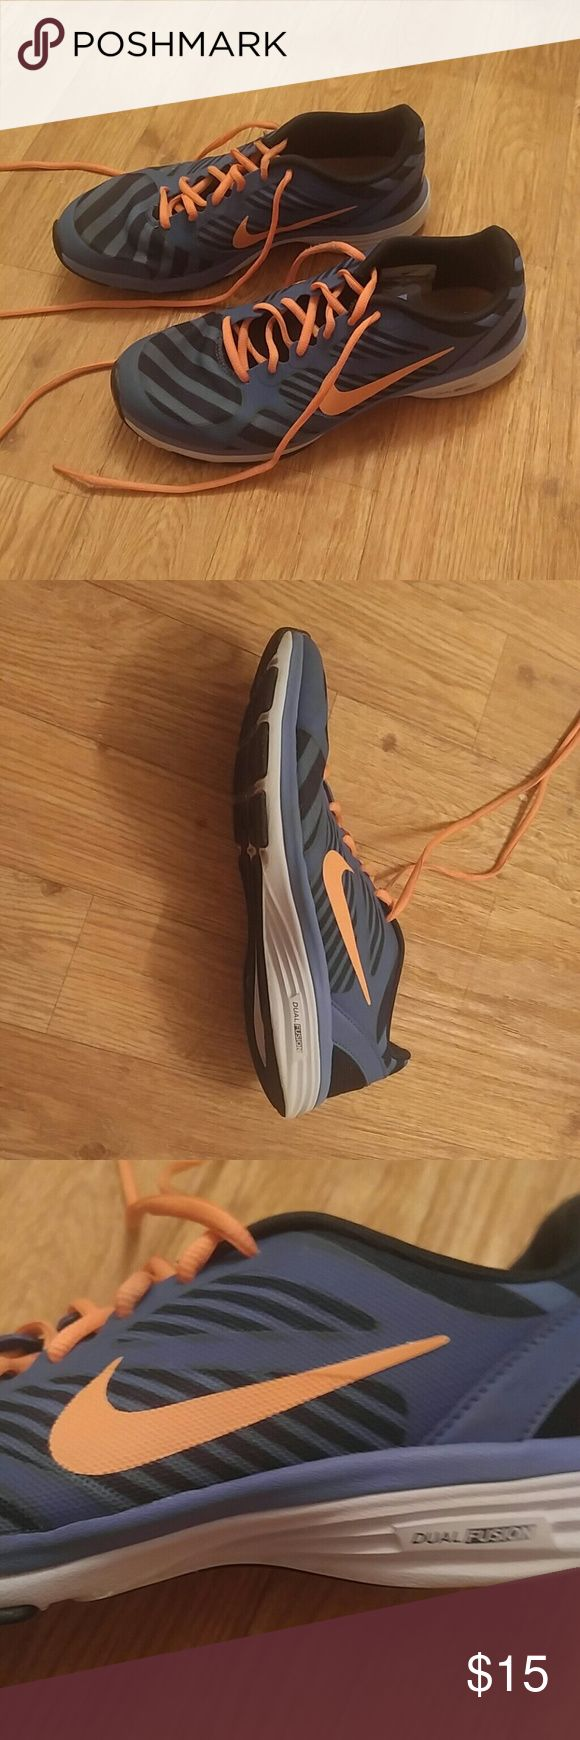 Nike dual fusion sport tennis shoe striped blue